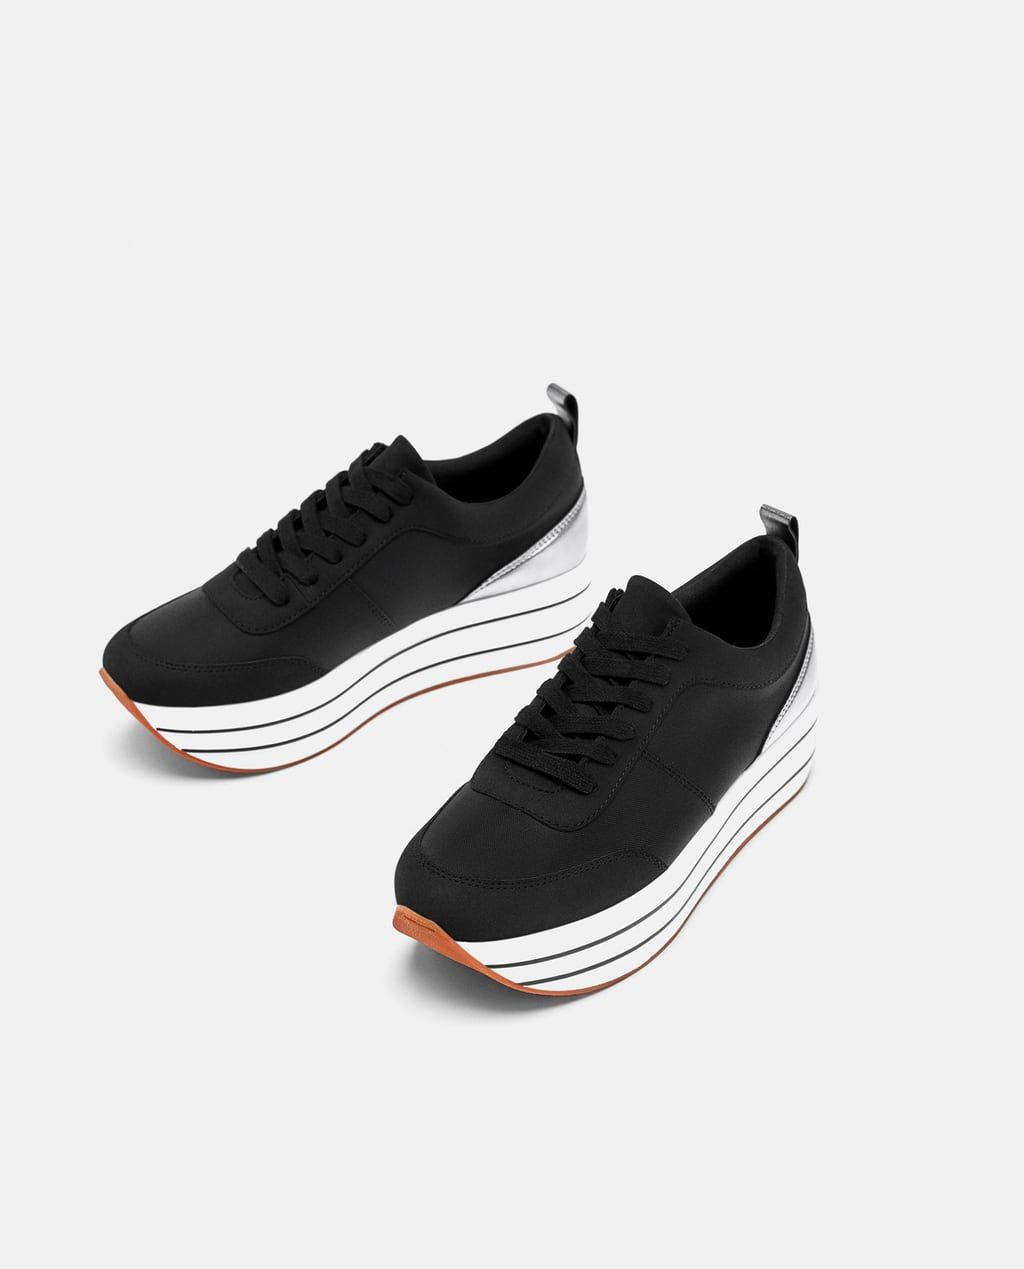 Zdjecie 1 Buty Sportowe Na Platformie Z Zara Platform Sneakers Trending Sneakers Nike Shoes Women